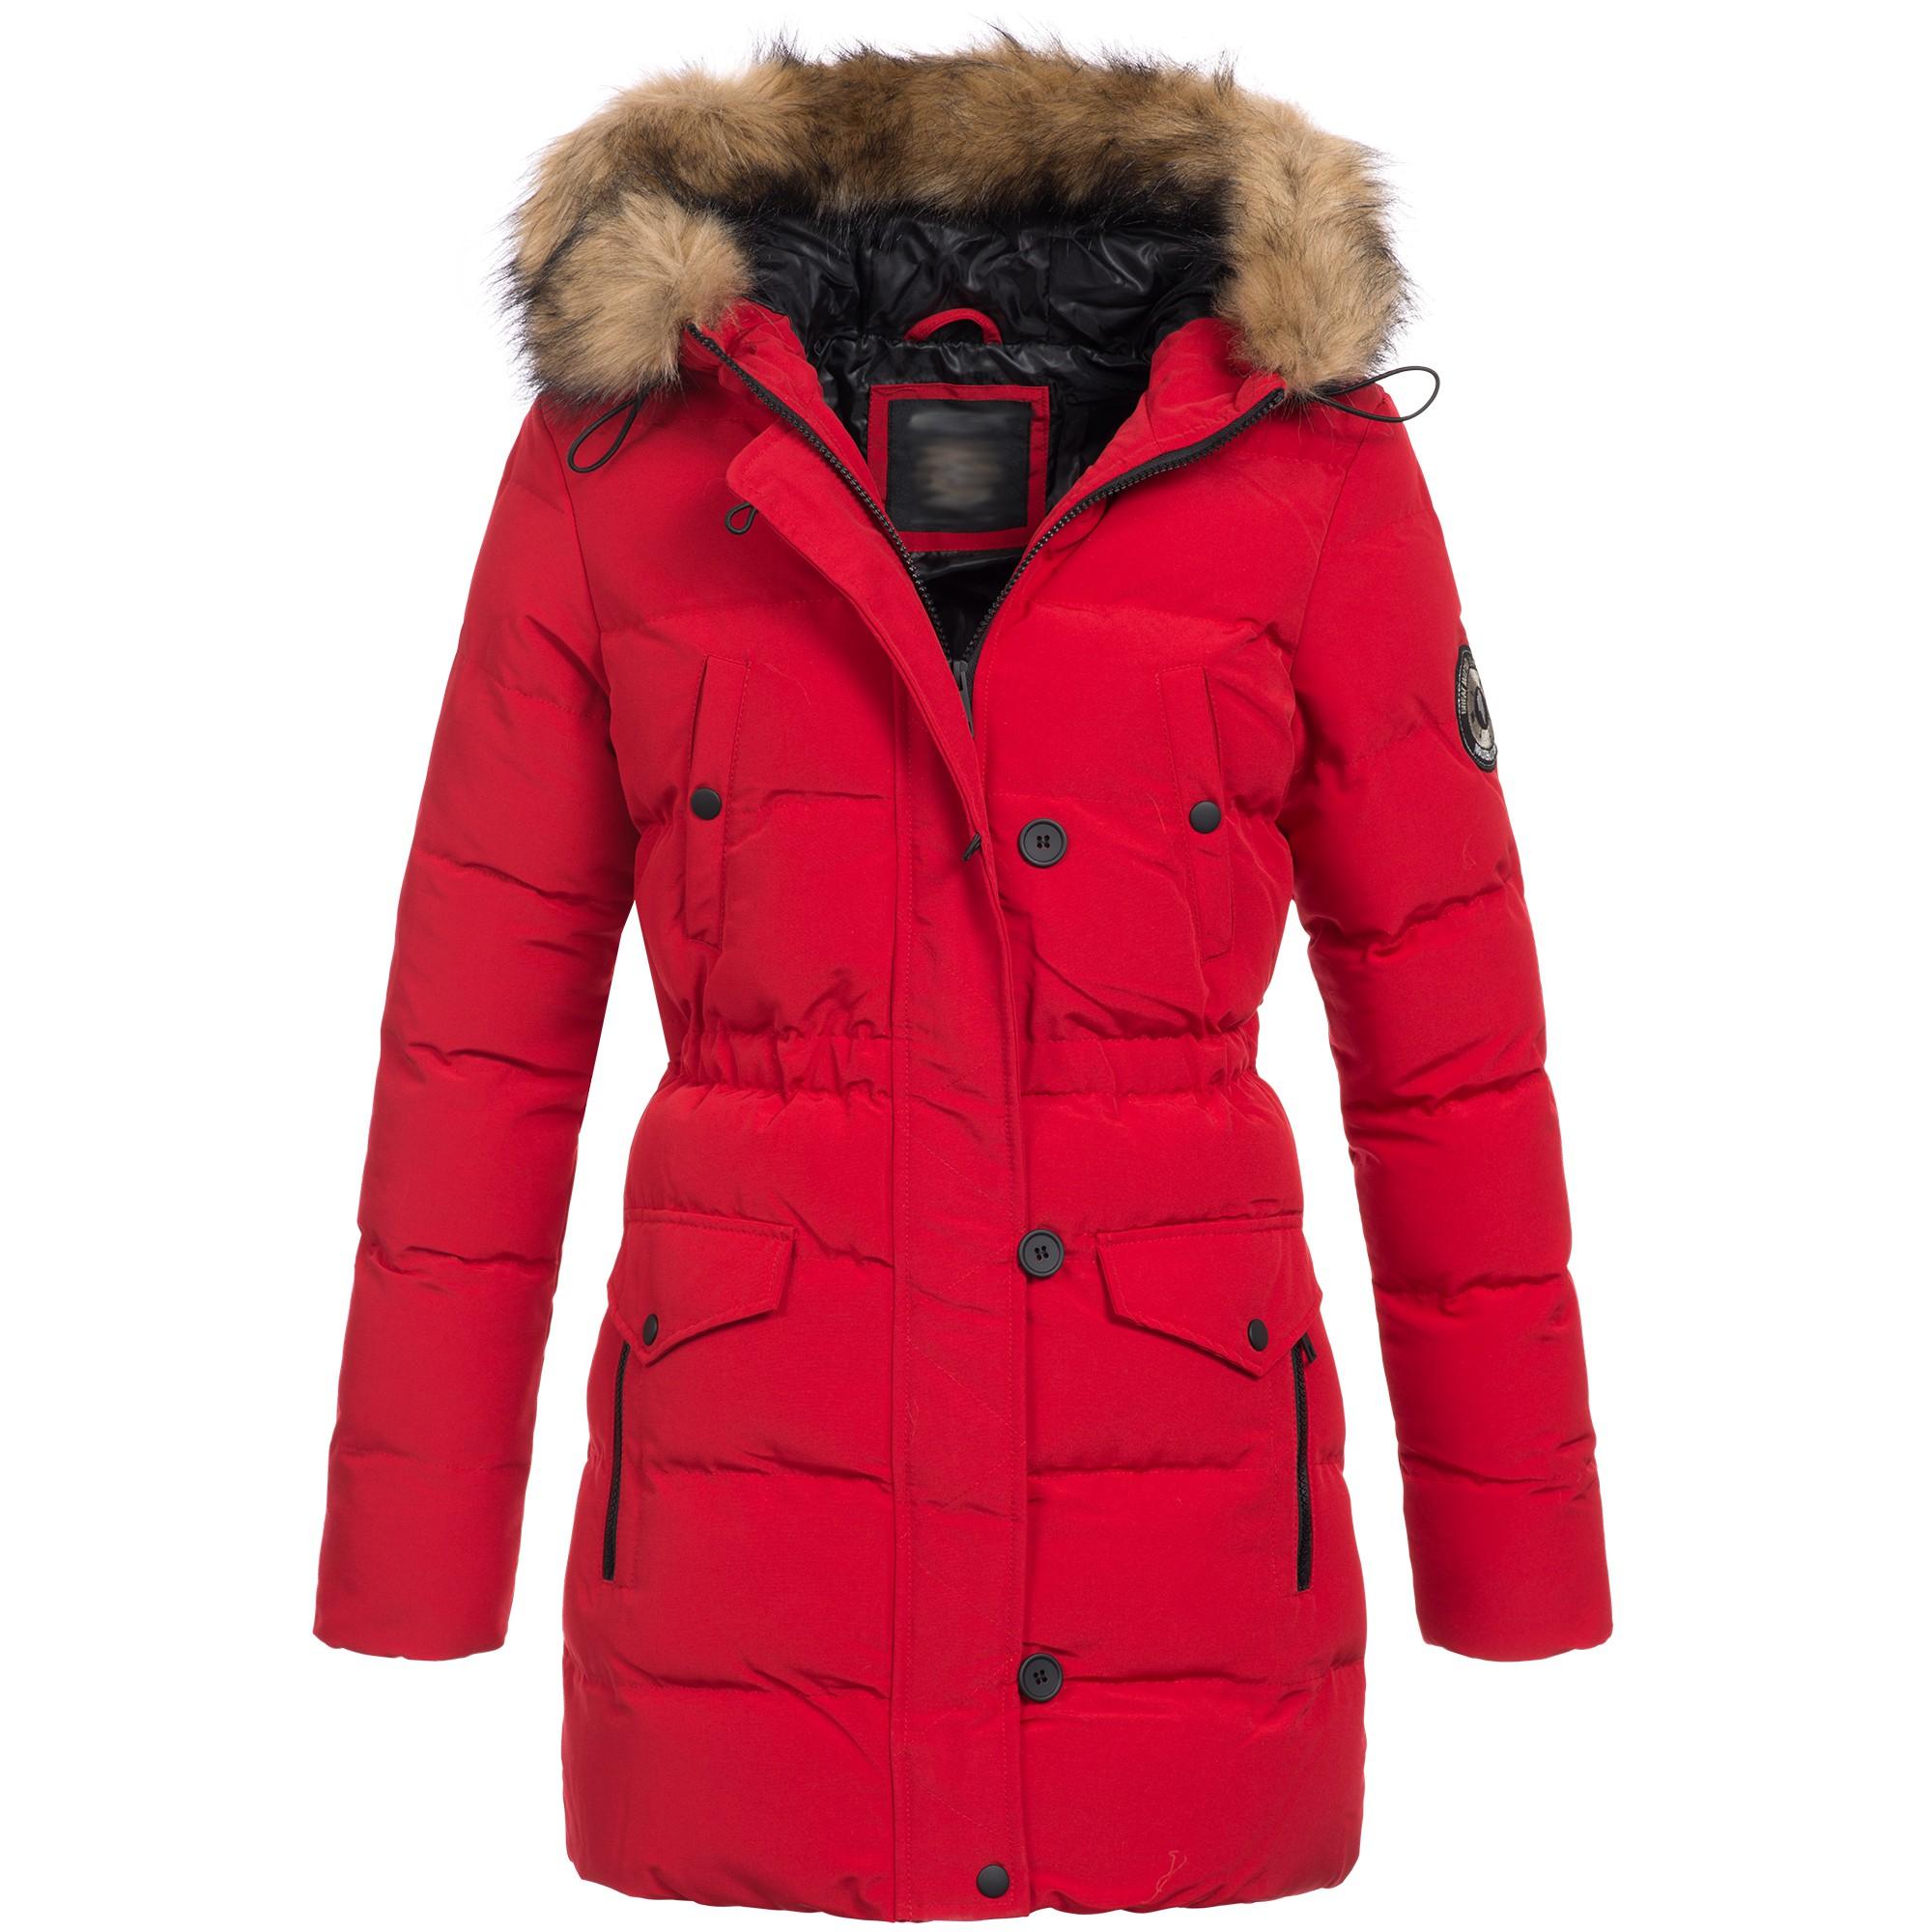 buy online b92c1 ccf46 Brave Soul Damen Winterjacke Mantel Parka Jacke Kunstfell Kapuze S-XXL AZ21